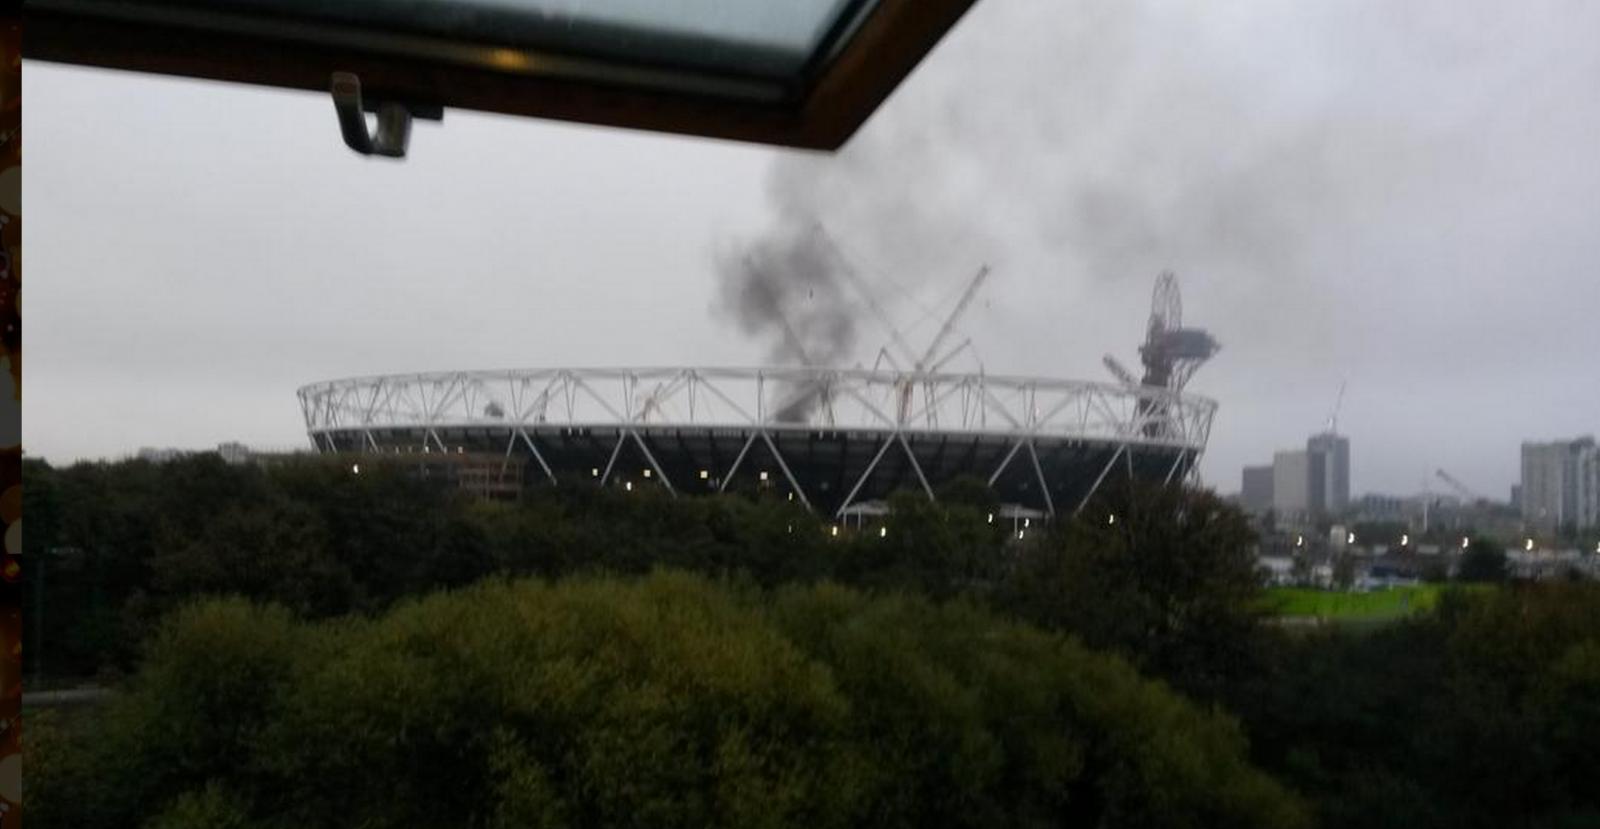 Fire at Olympic Stadium London